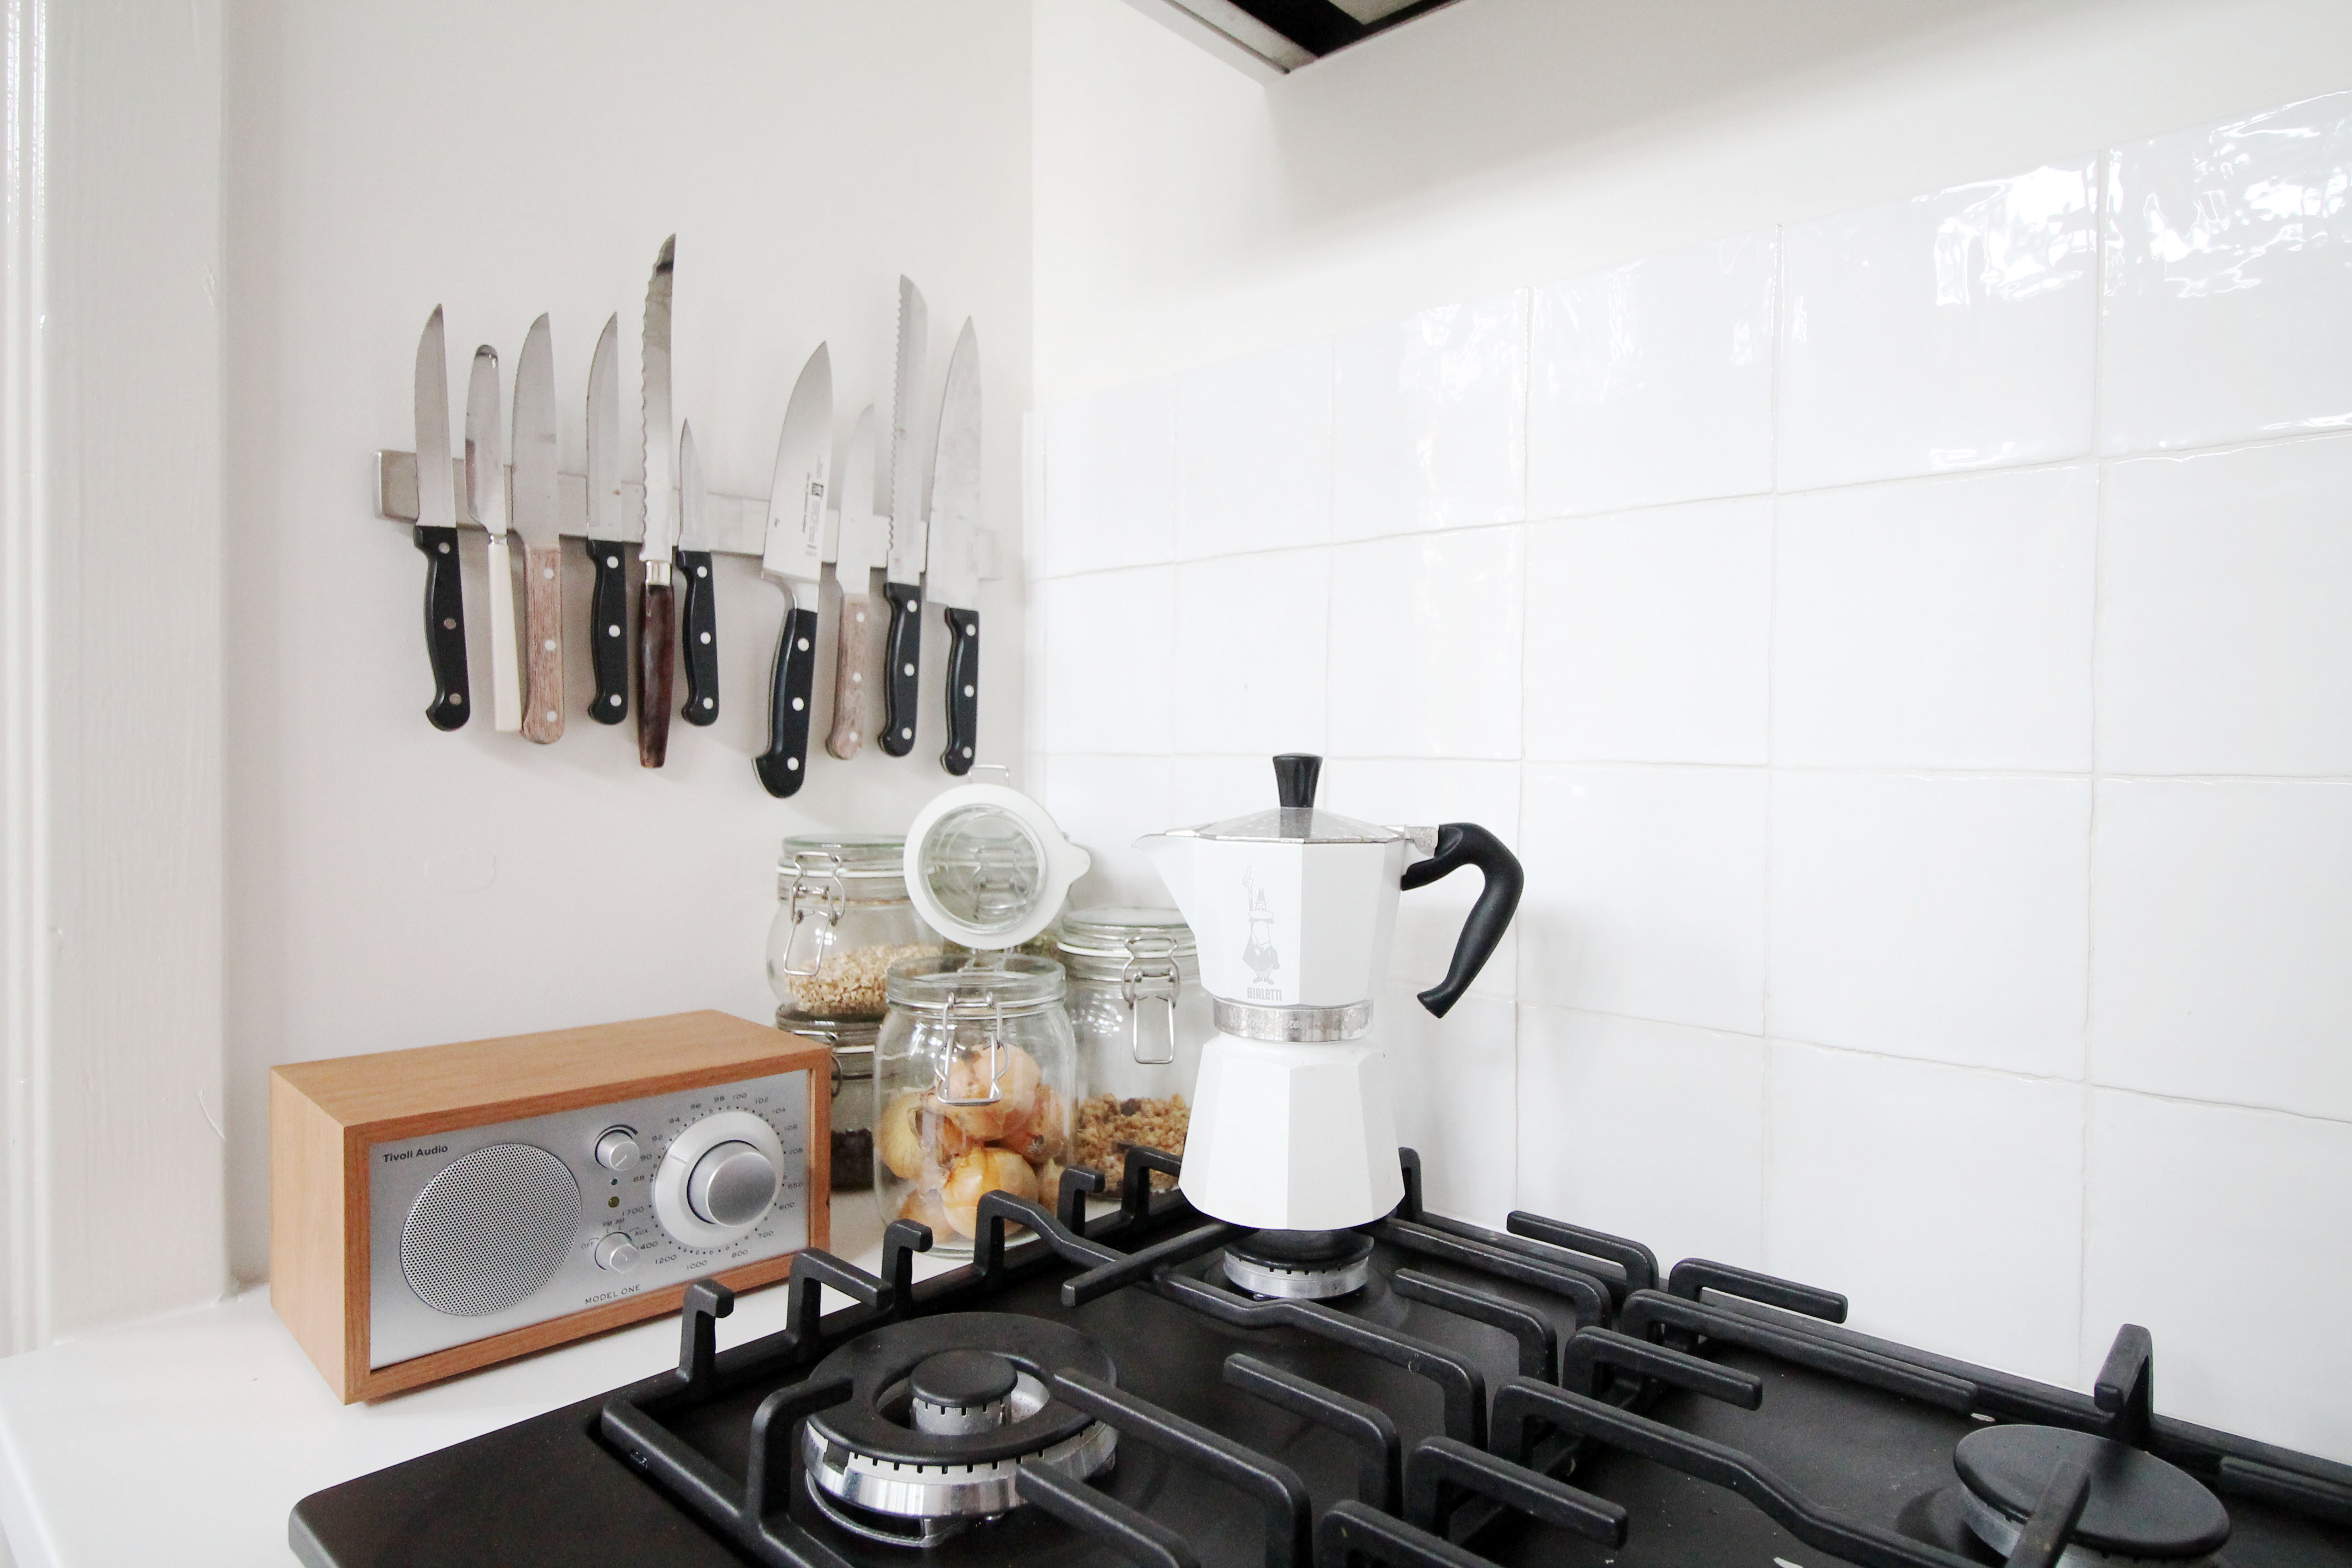 Tivoli radio review donebymyself - Tivoli kitchenware ...